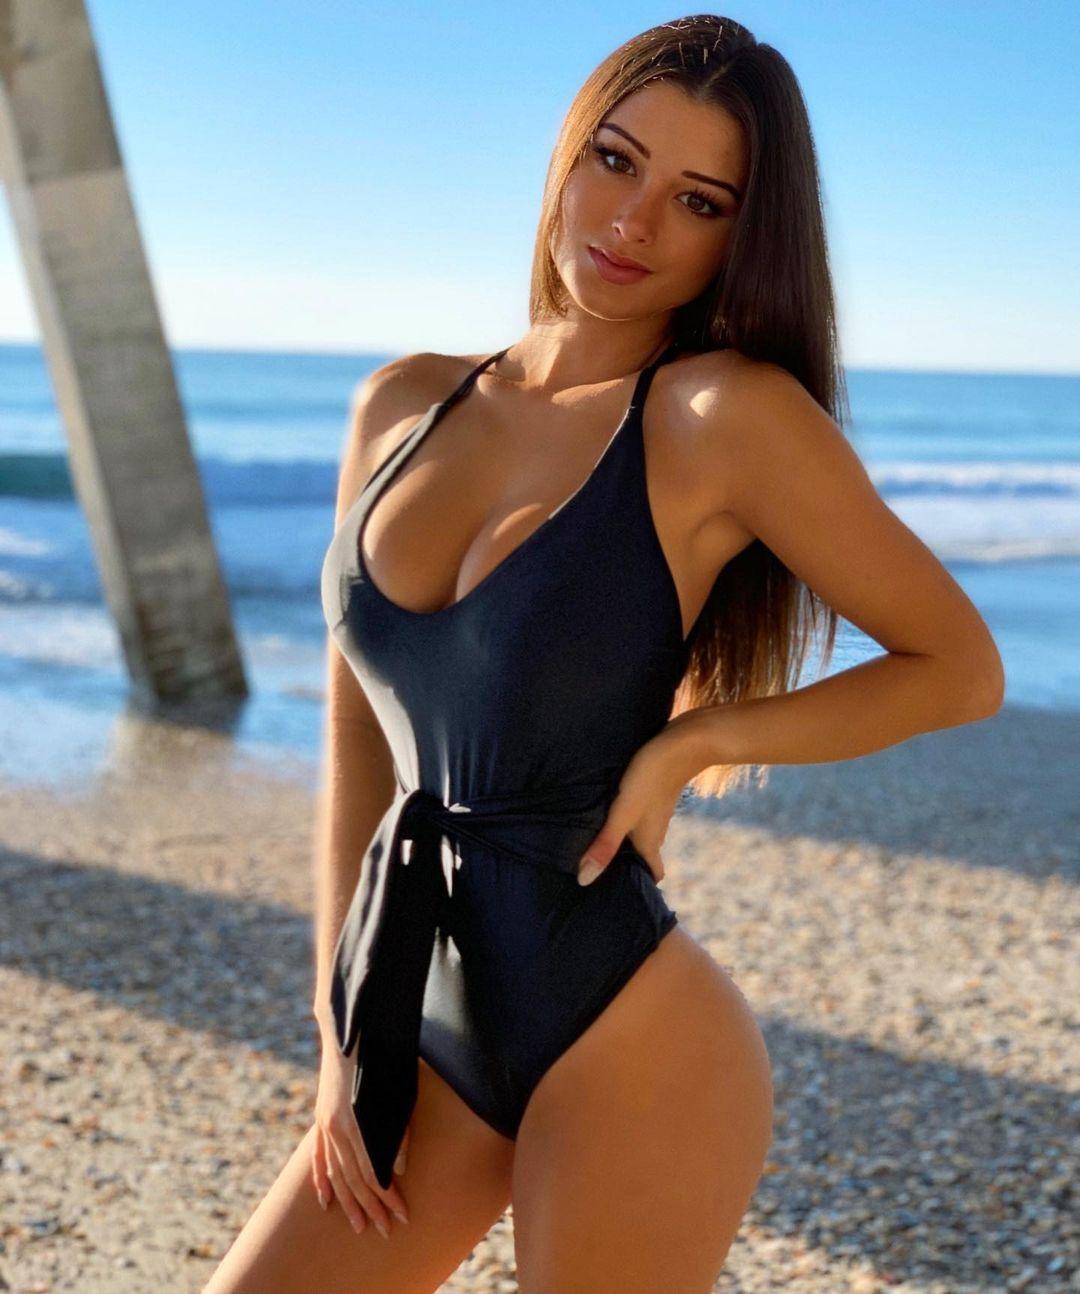 Kang keilah Bikini Model